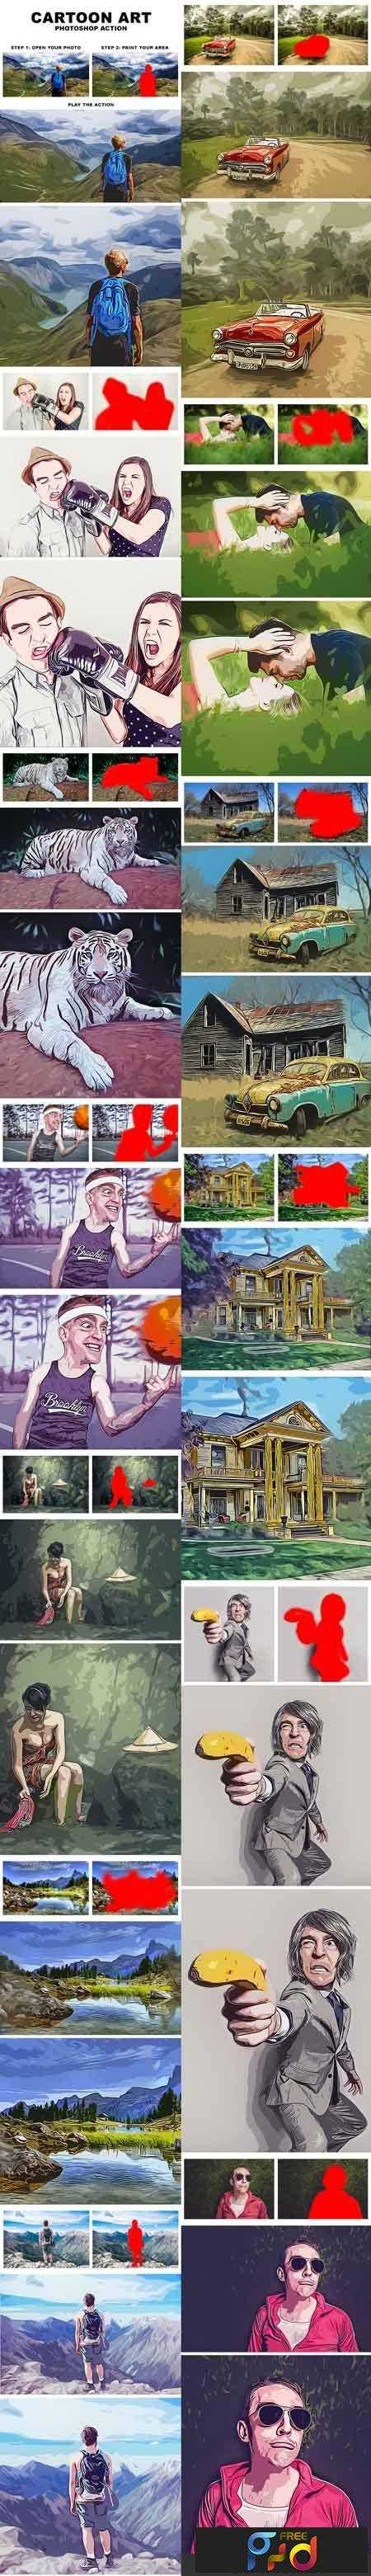 FreePsdVn.com_1704026_PHOTOSHOP_cartoon_art_photoshop_action_20203842